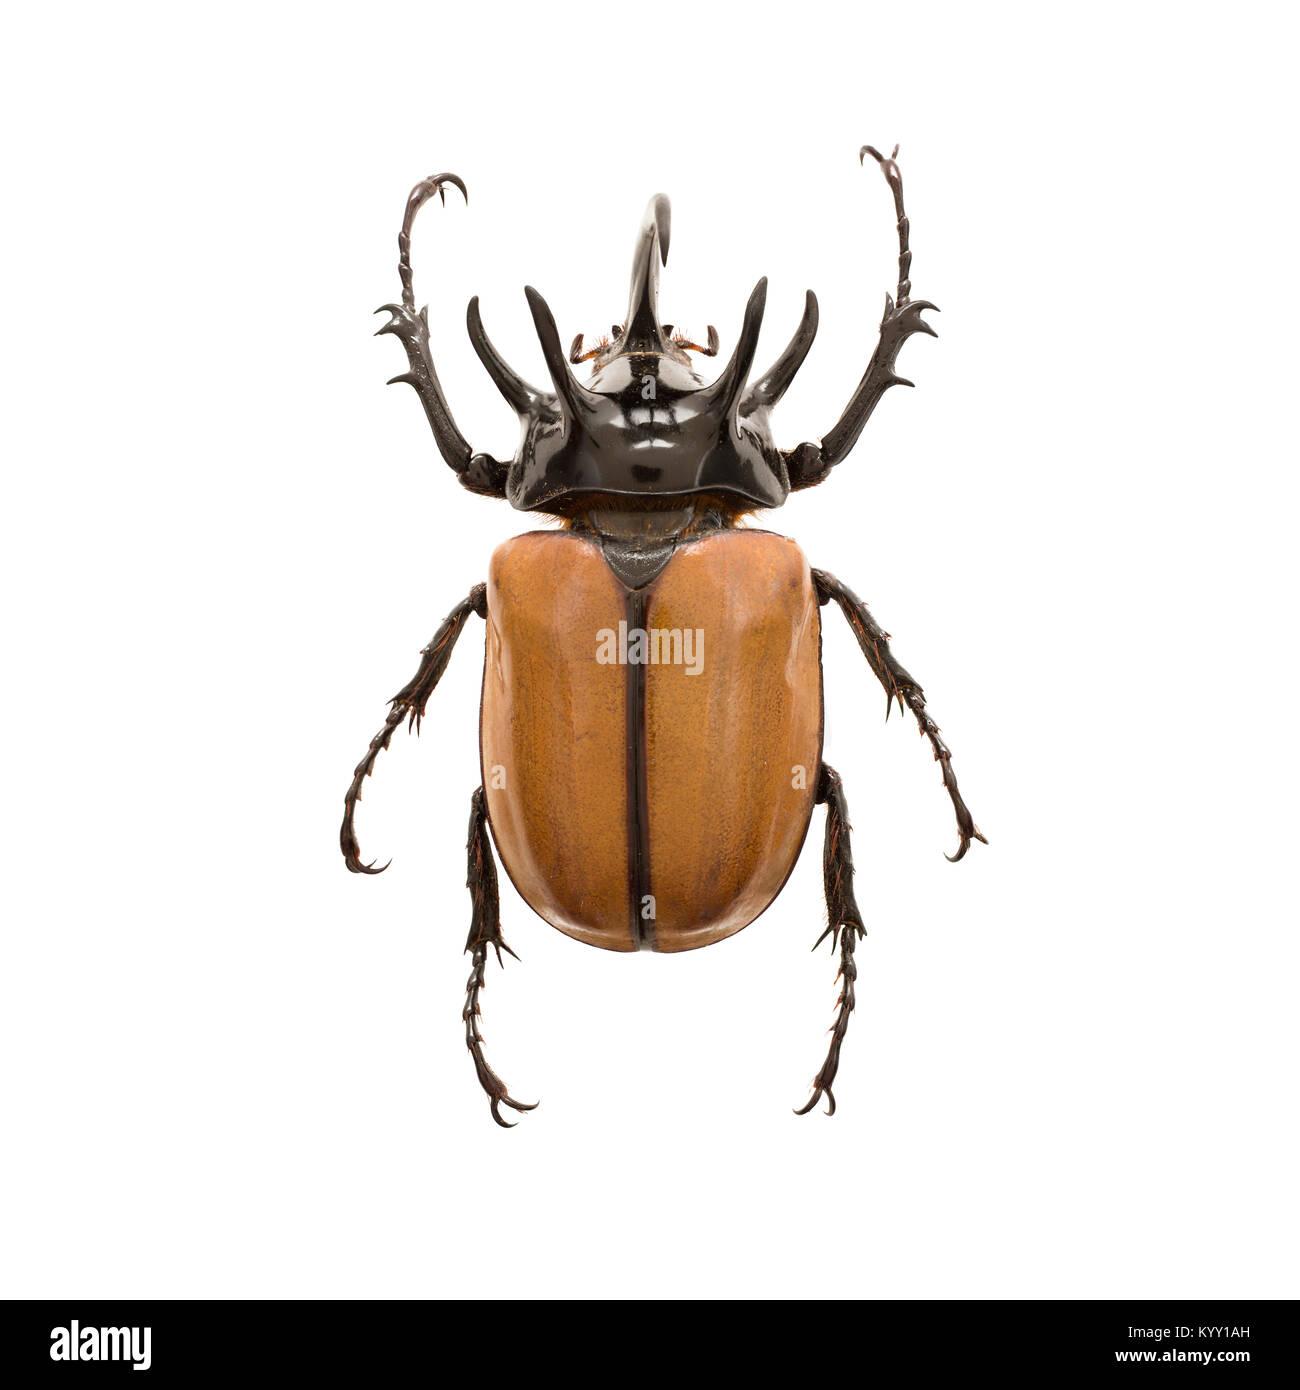 Beetle over white background - Stock Image